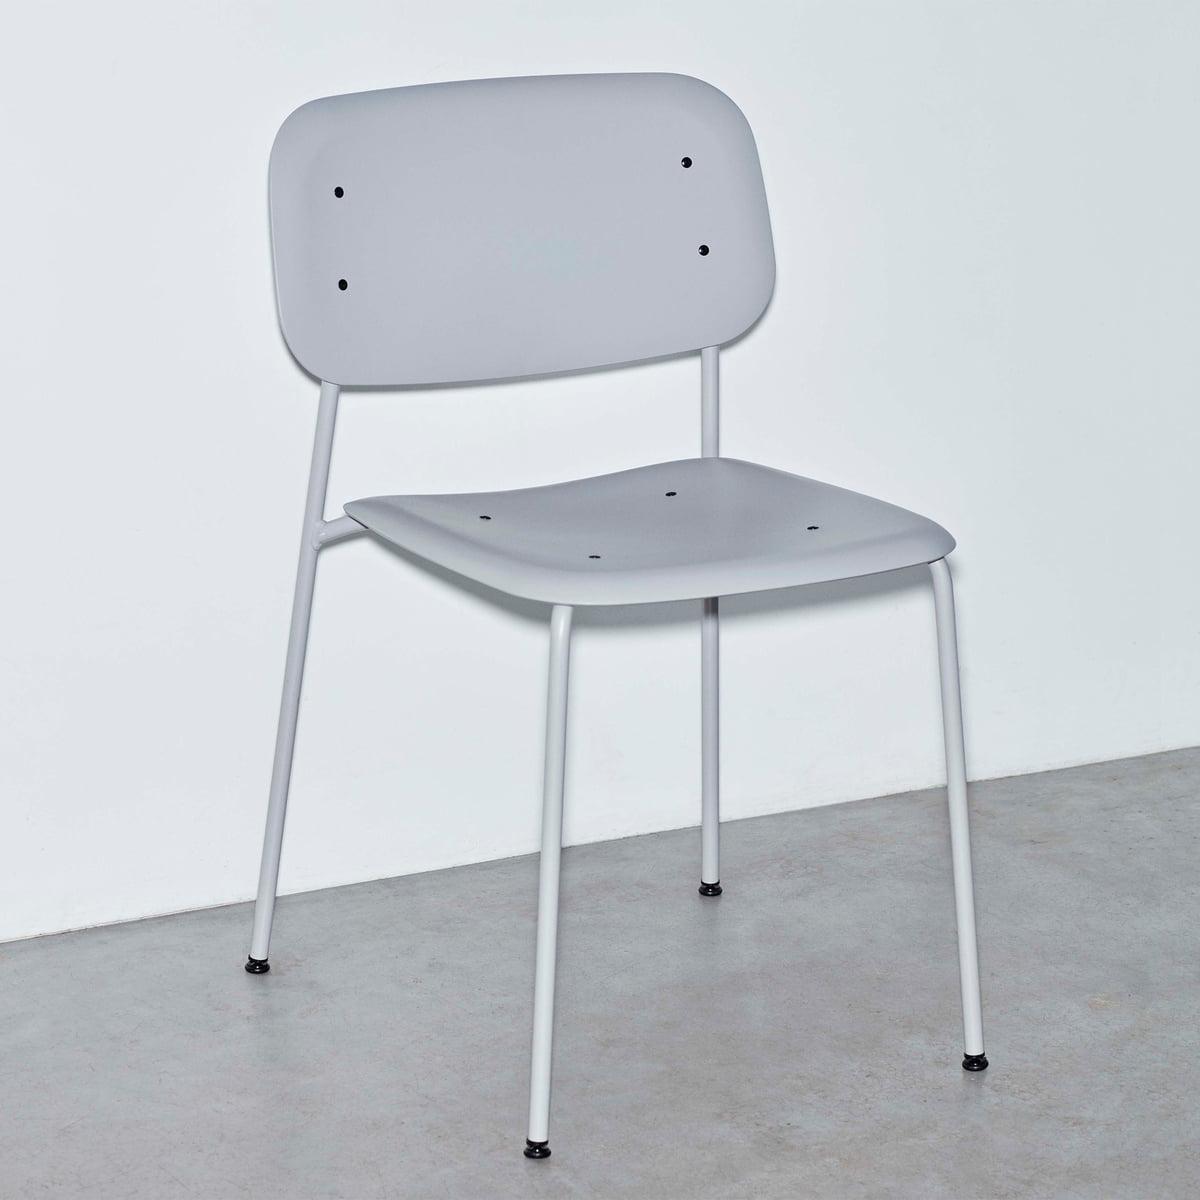 Hay stuhl simple hay j natural beech stuhl design chair for Hay stuhl replica